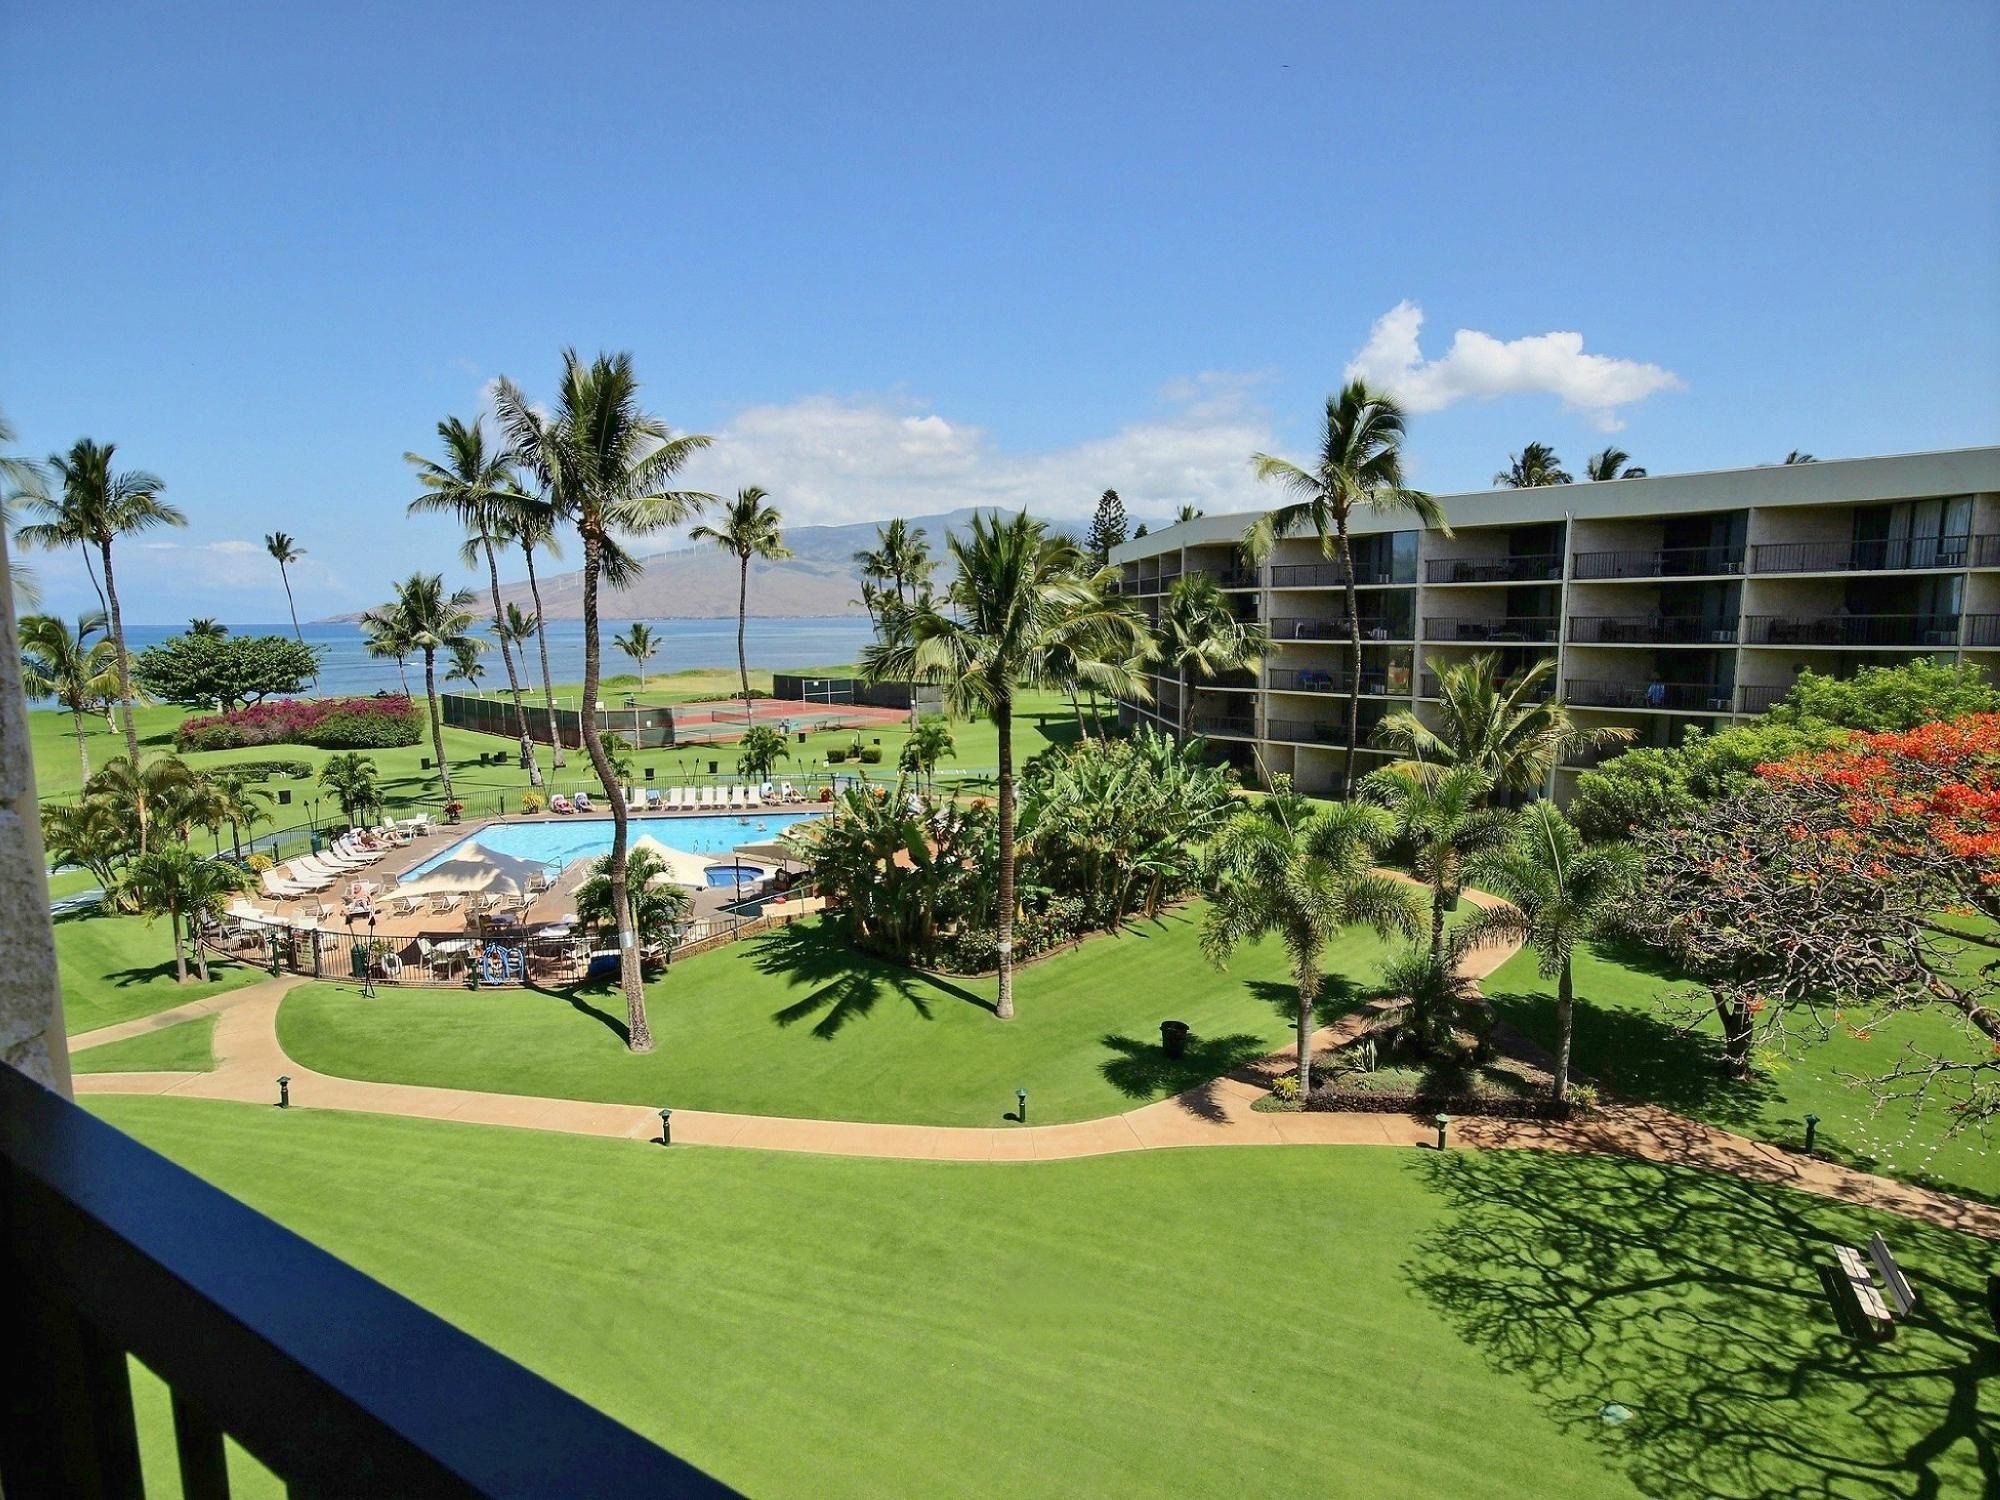 1032 S Kihei Rd, Maui, HI